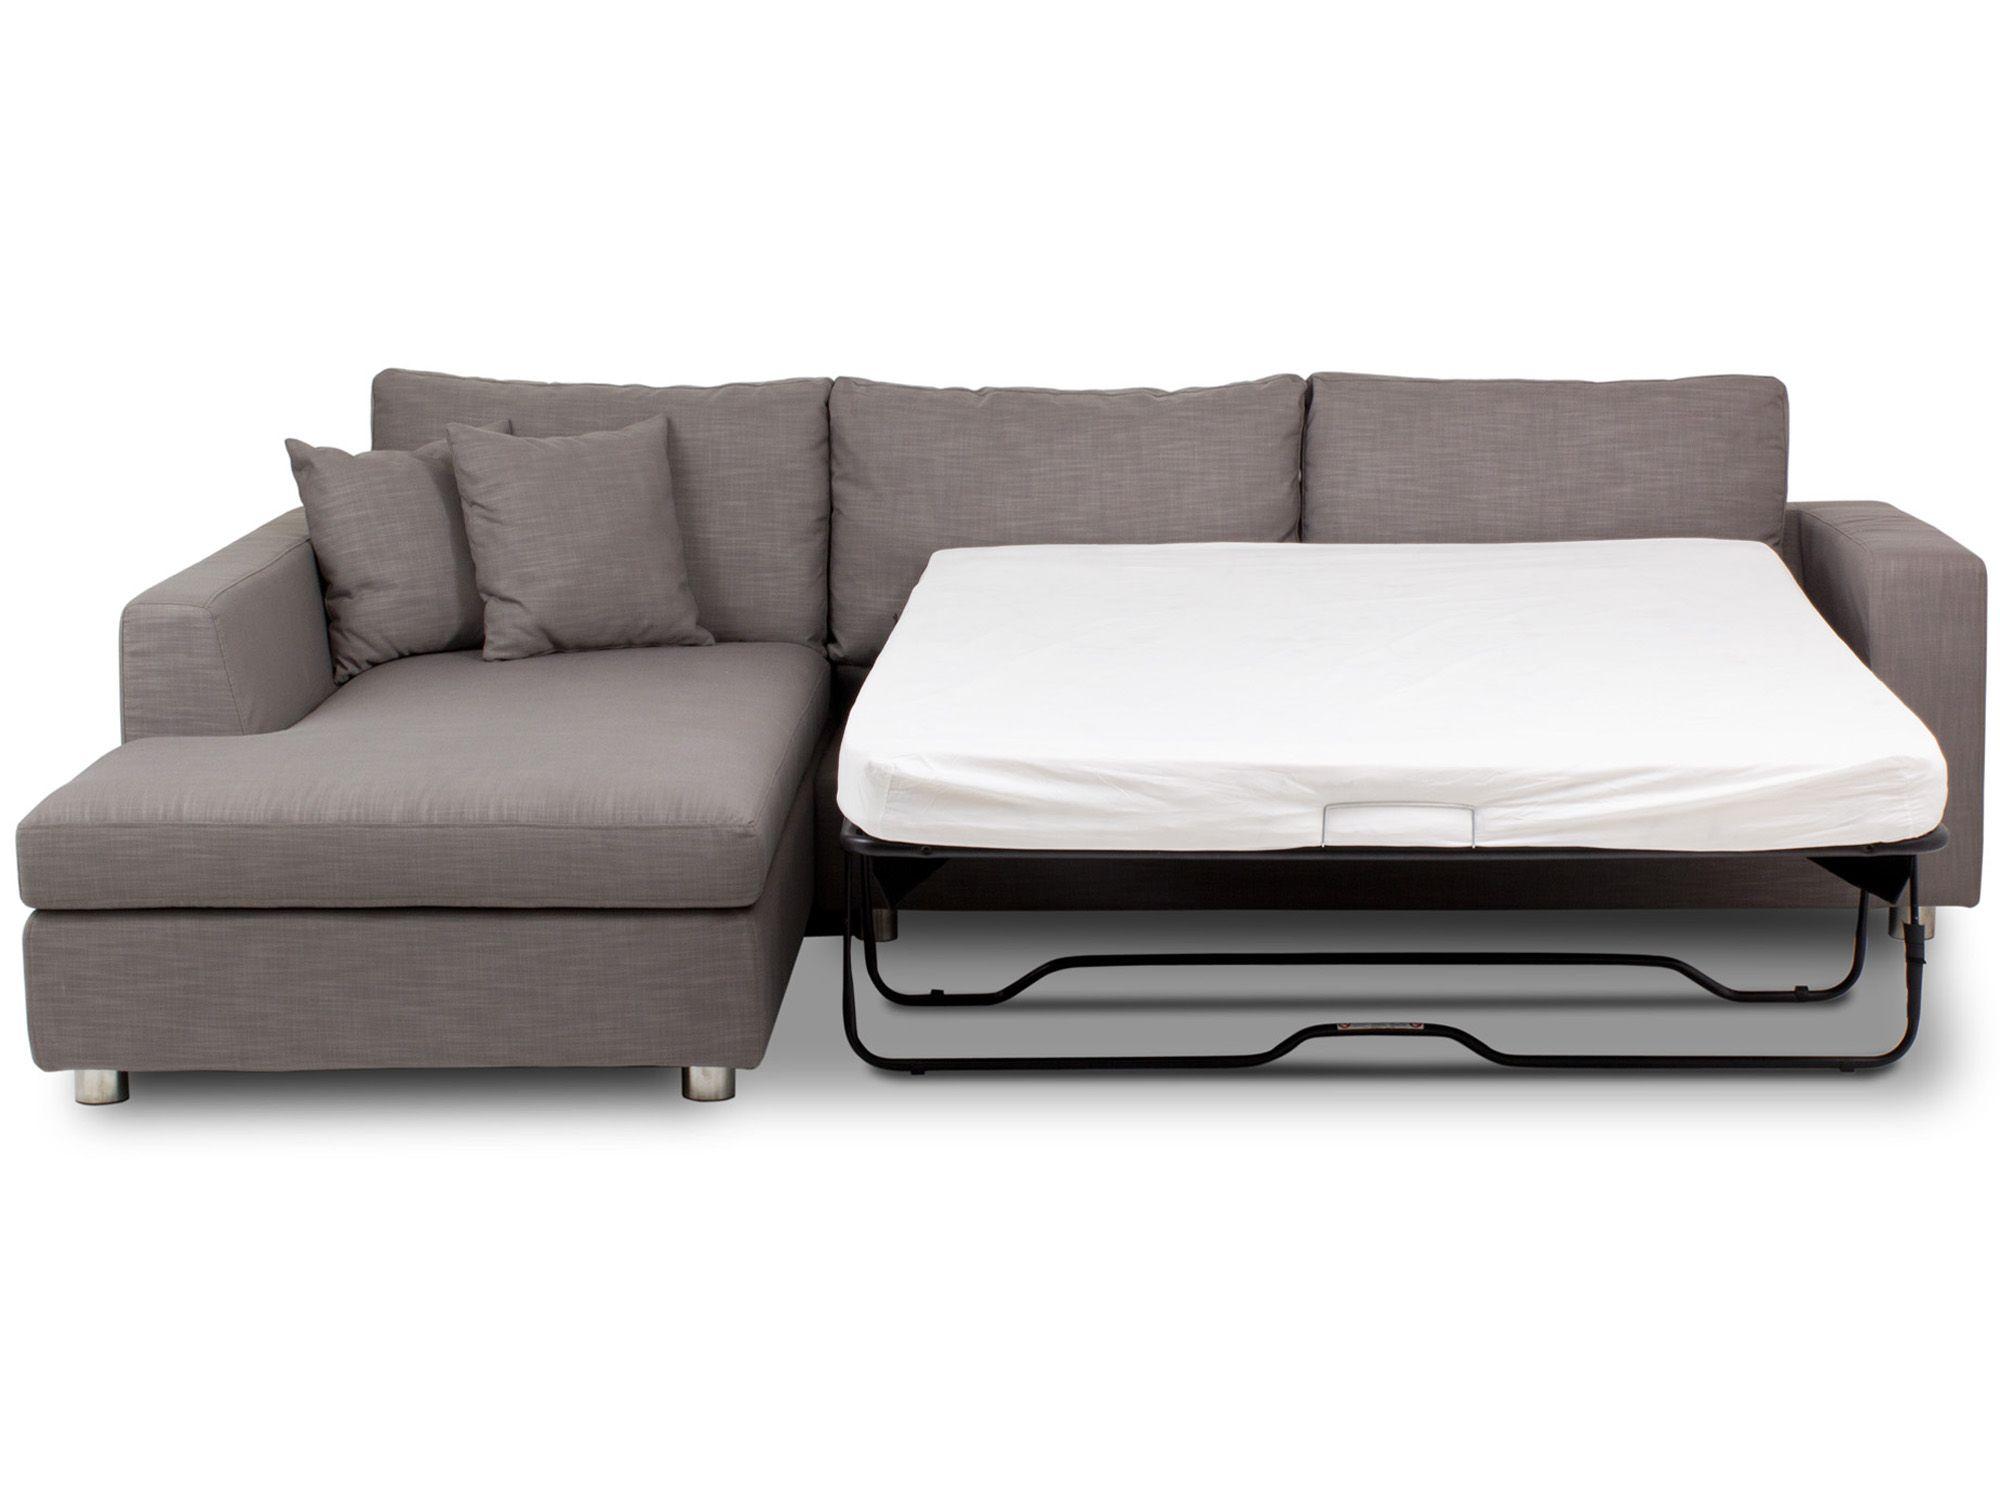 Mondo Storage Corner Sofa Bed Cabana Sofa Bed With